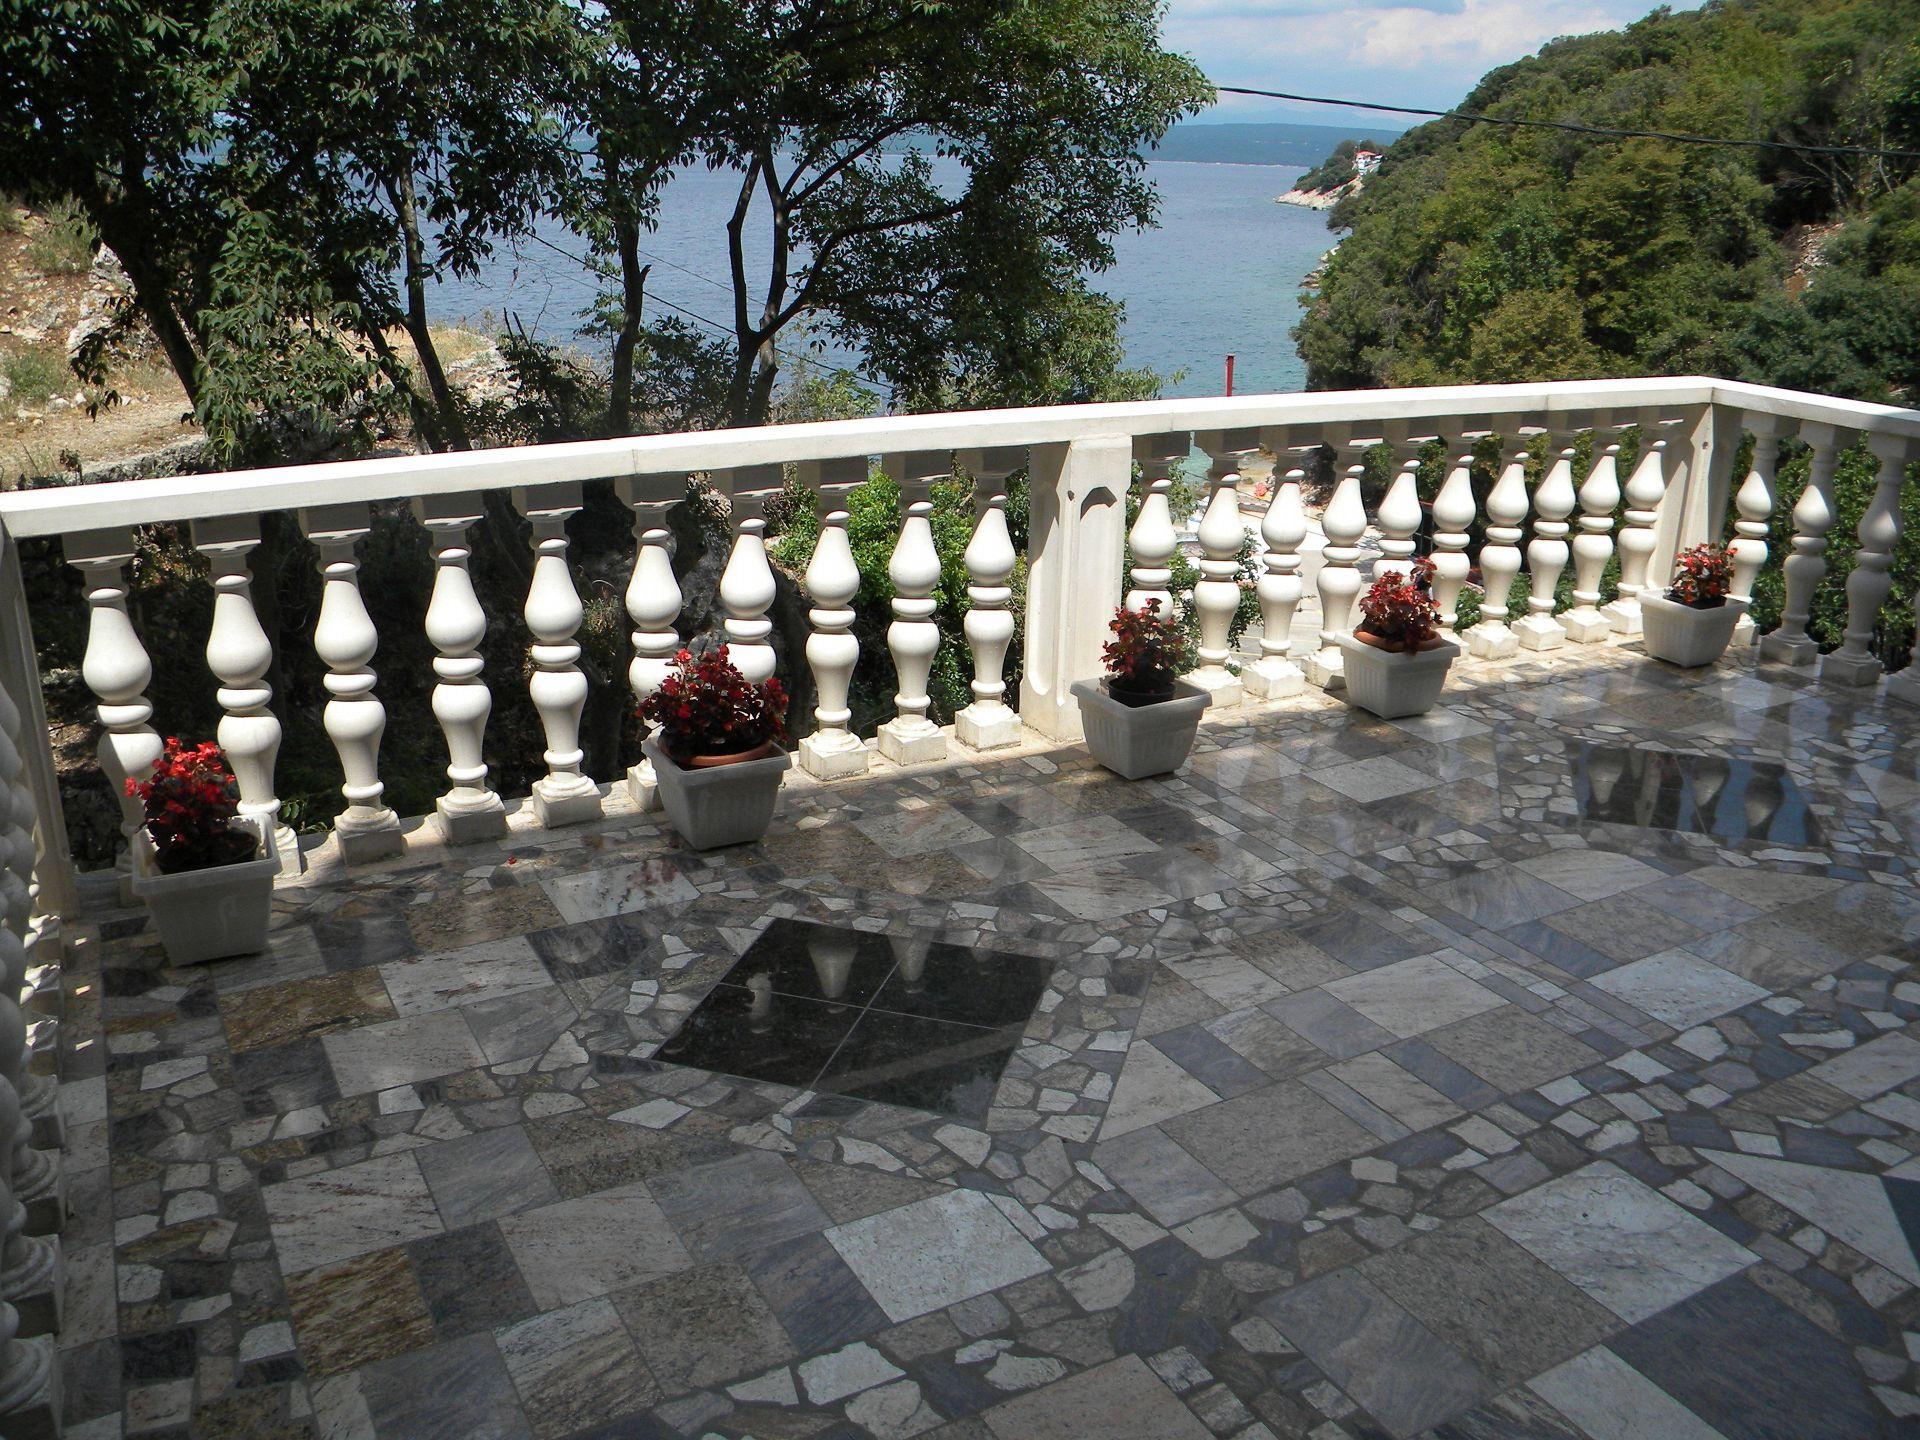 Appartement de vacances BT A2(4) - Merag (769321), Merag, Île de Cres, Kvarner, Croatie, image 5